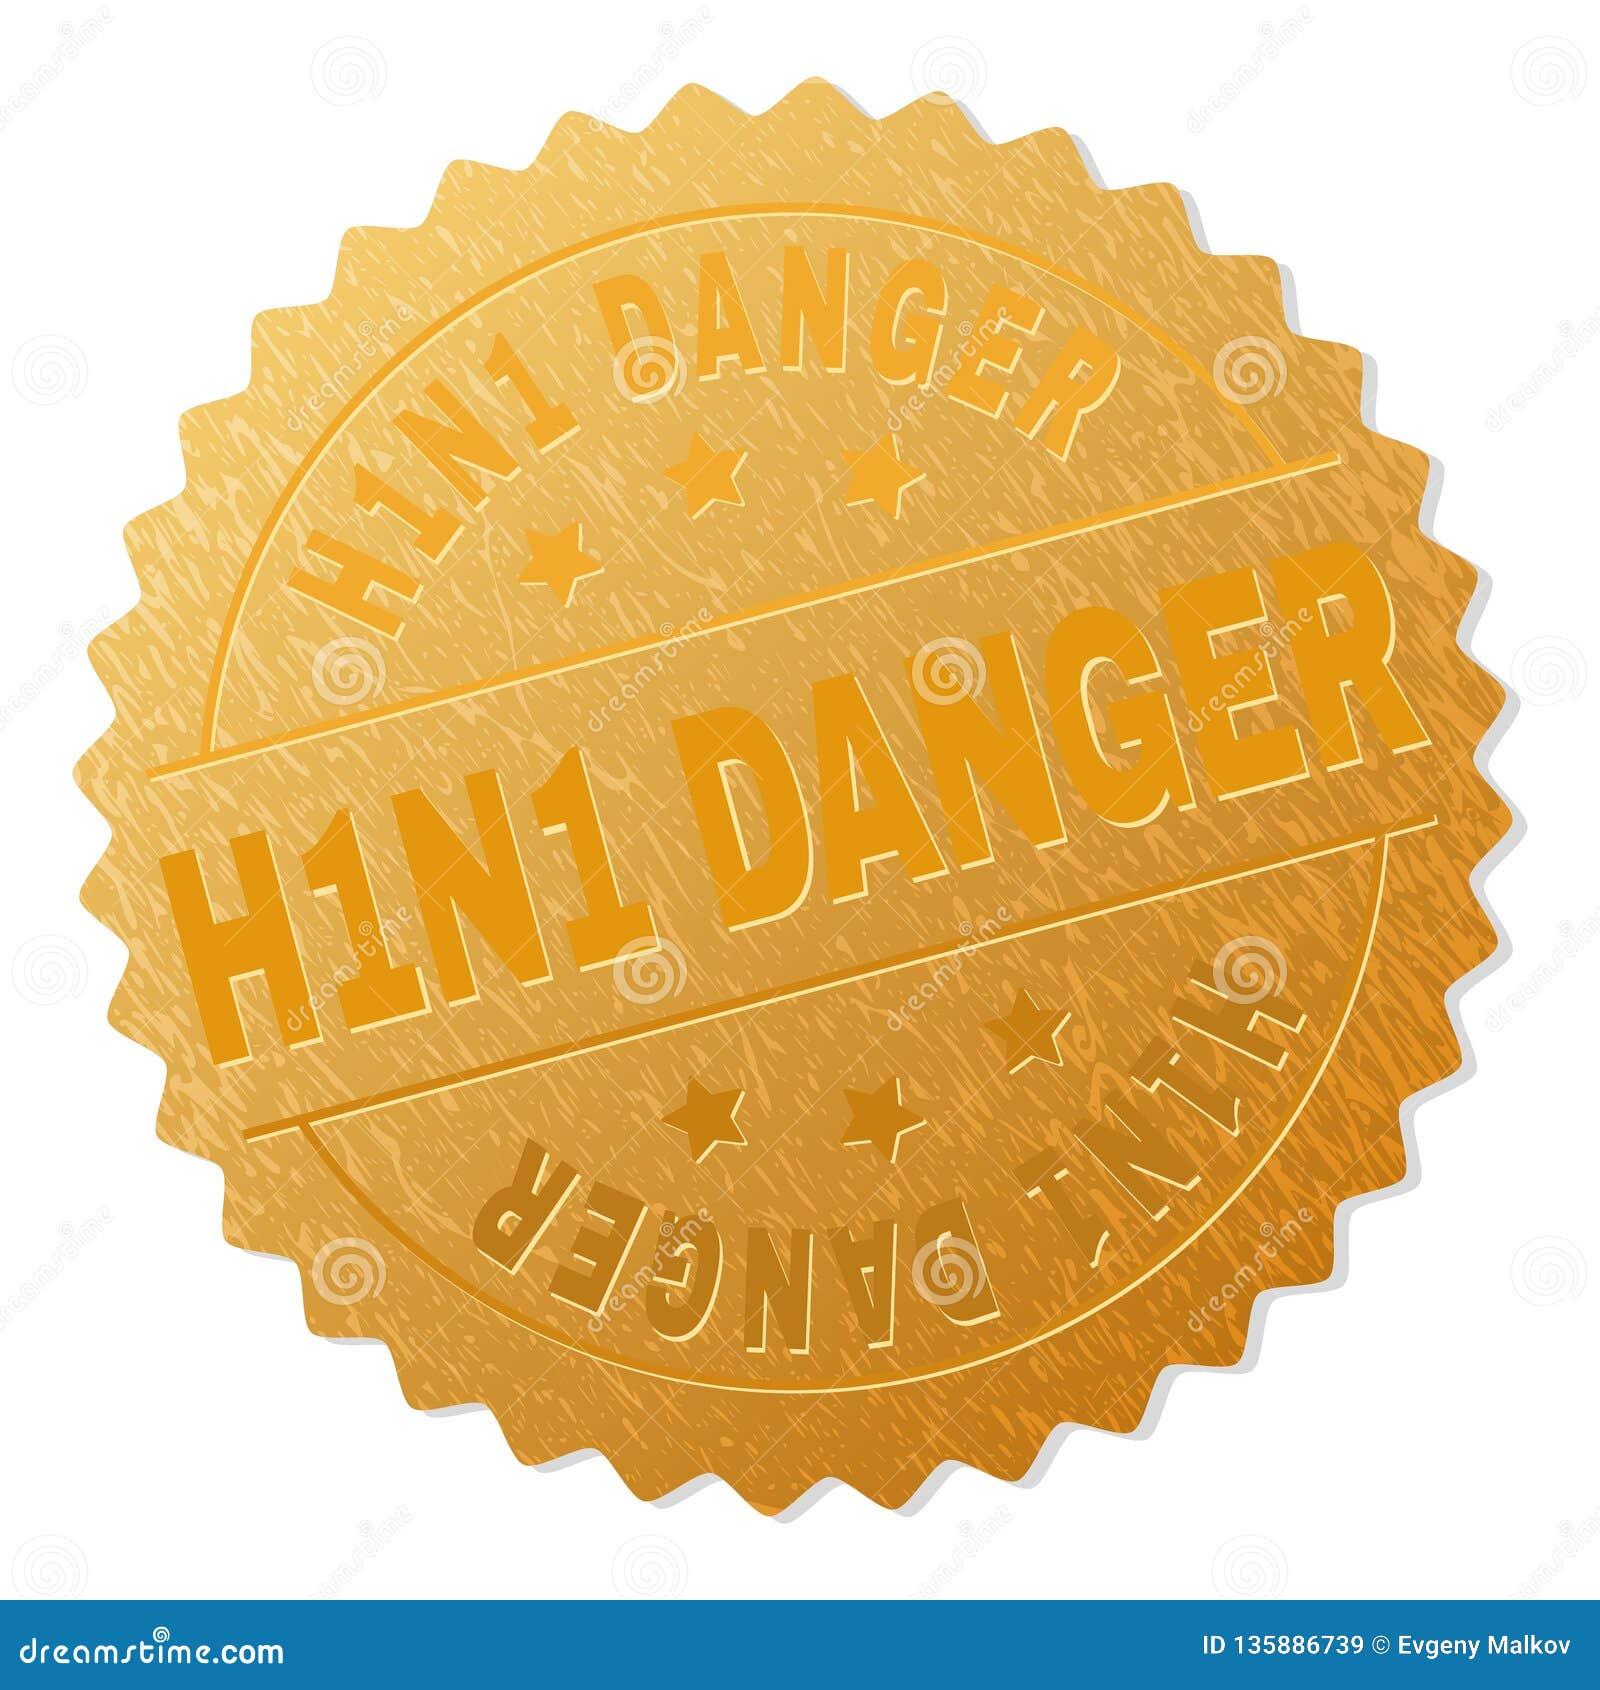 Selo do crachá do PERIGO do ouro H1N1